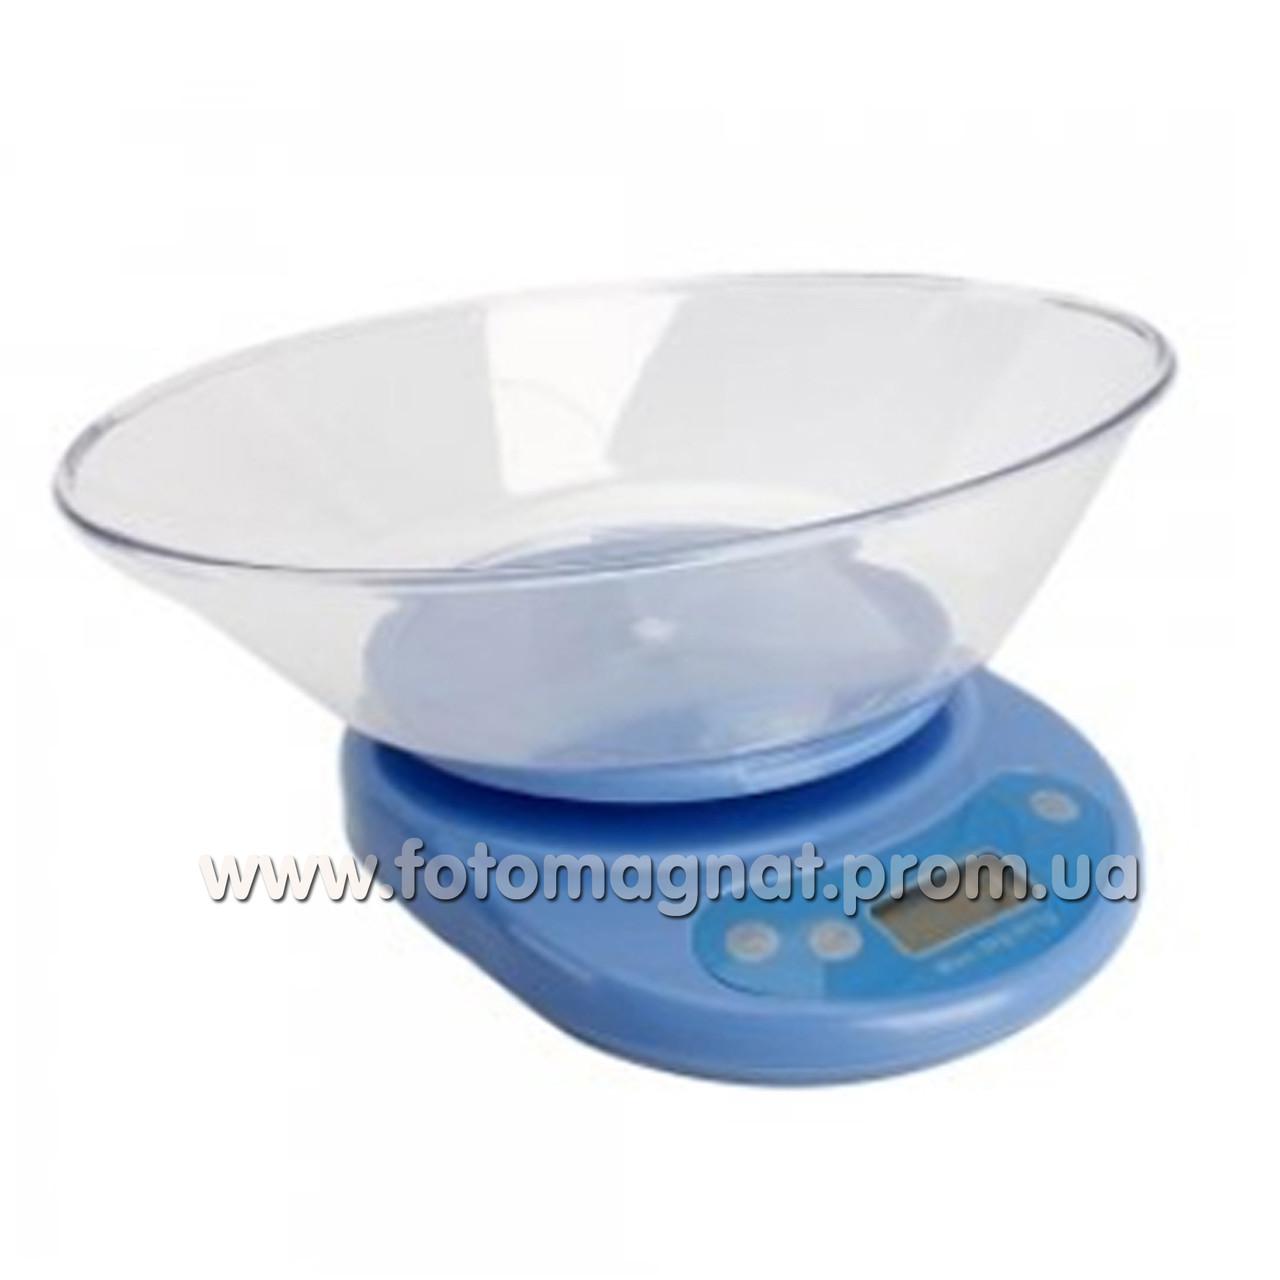 Весы кухонные электронные NN  KE 02 (электронные весы)